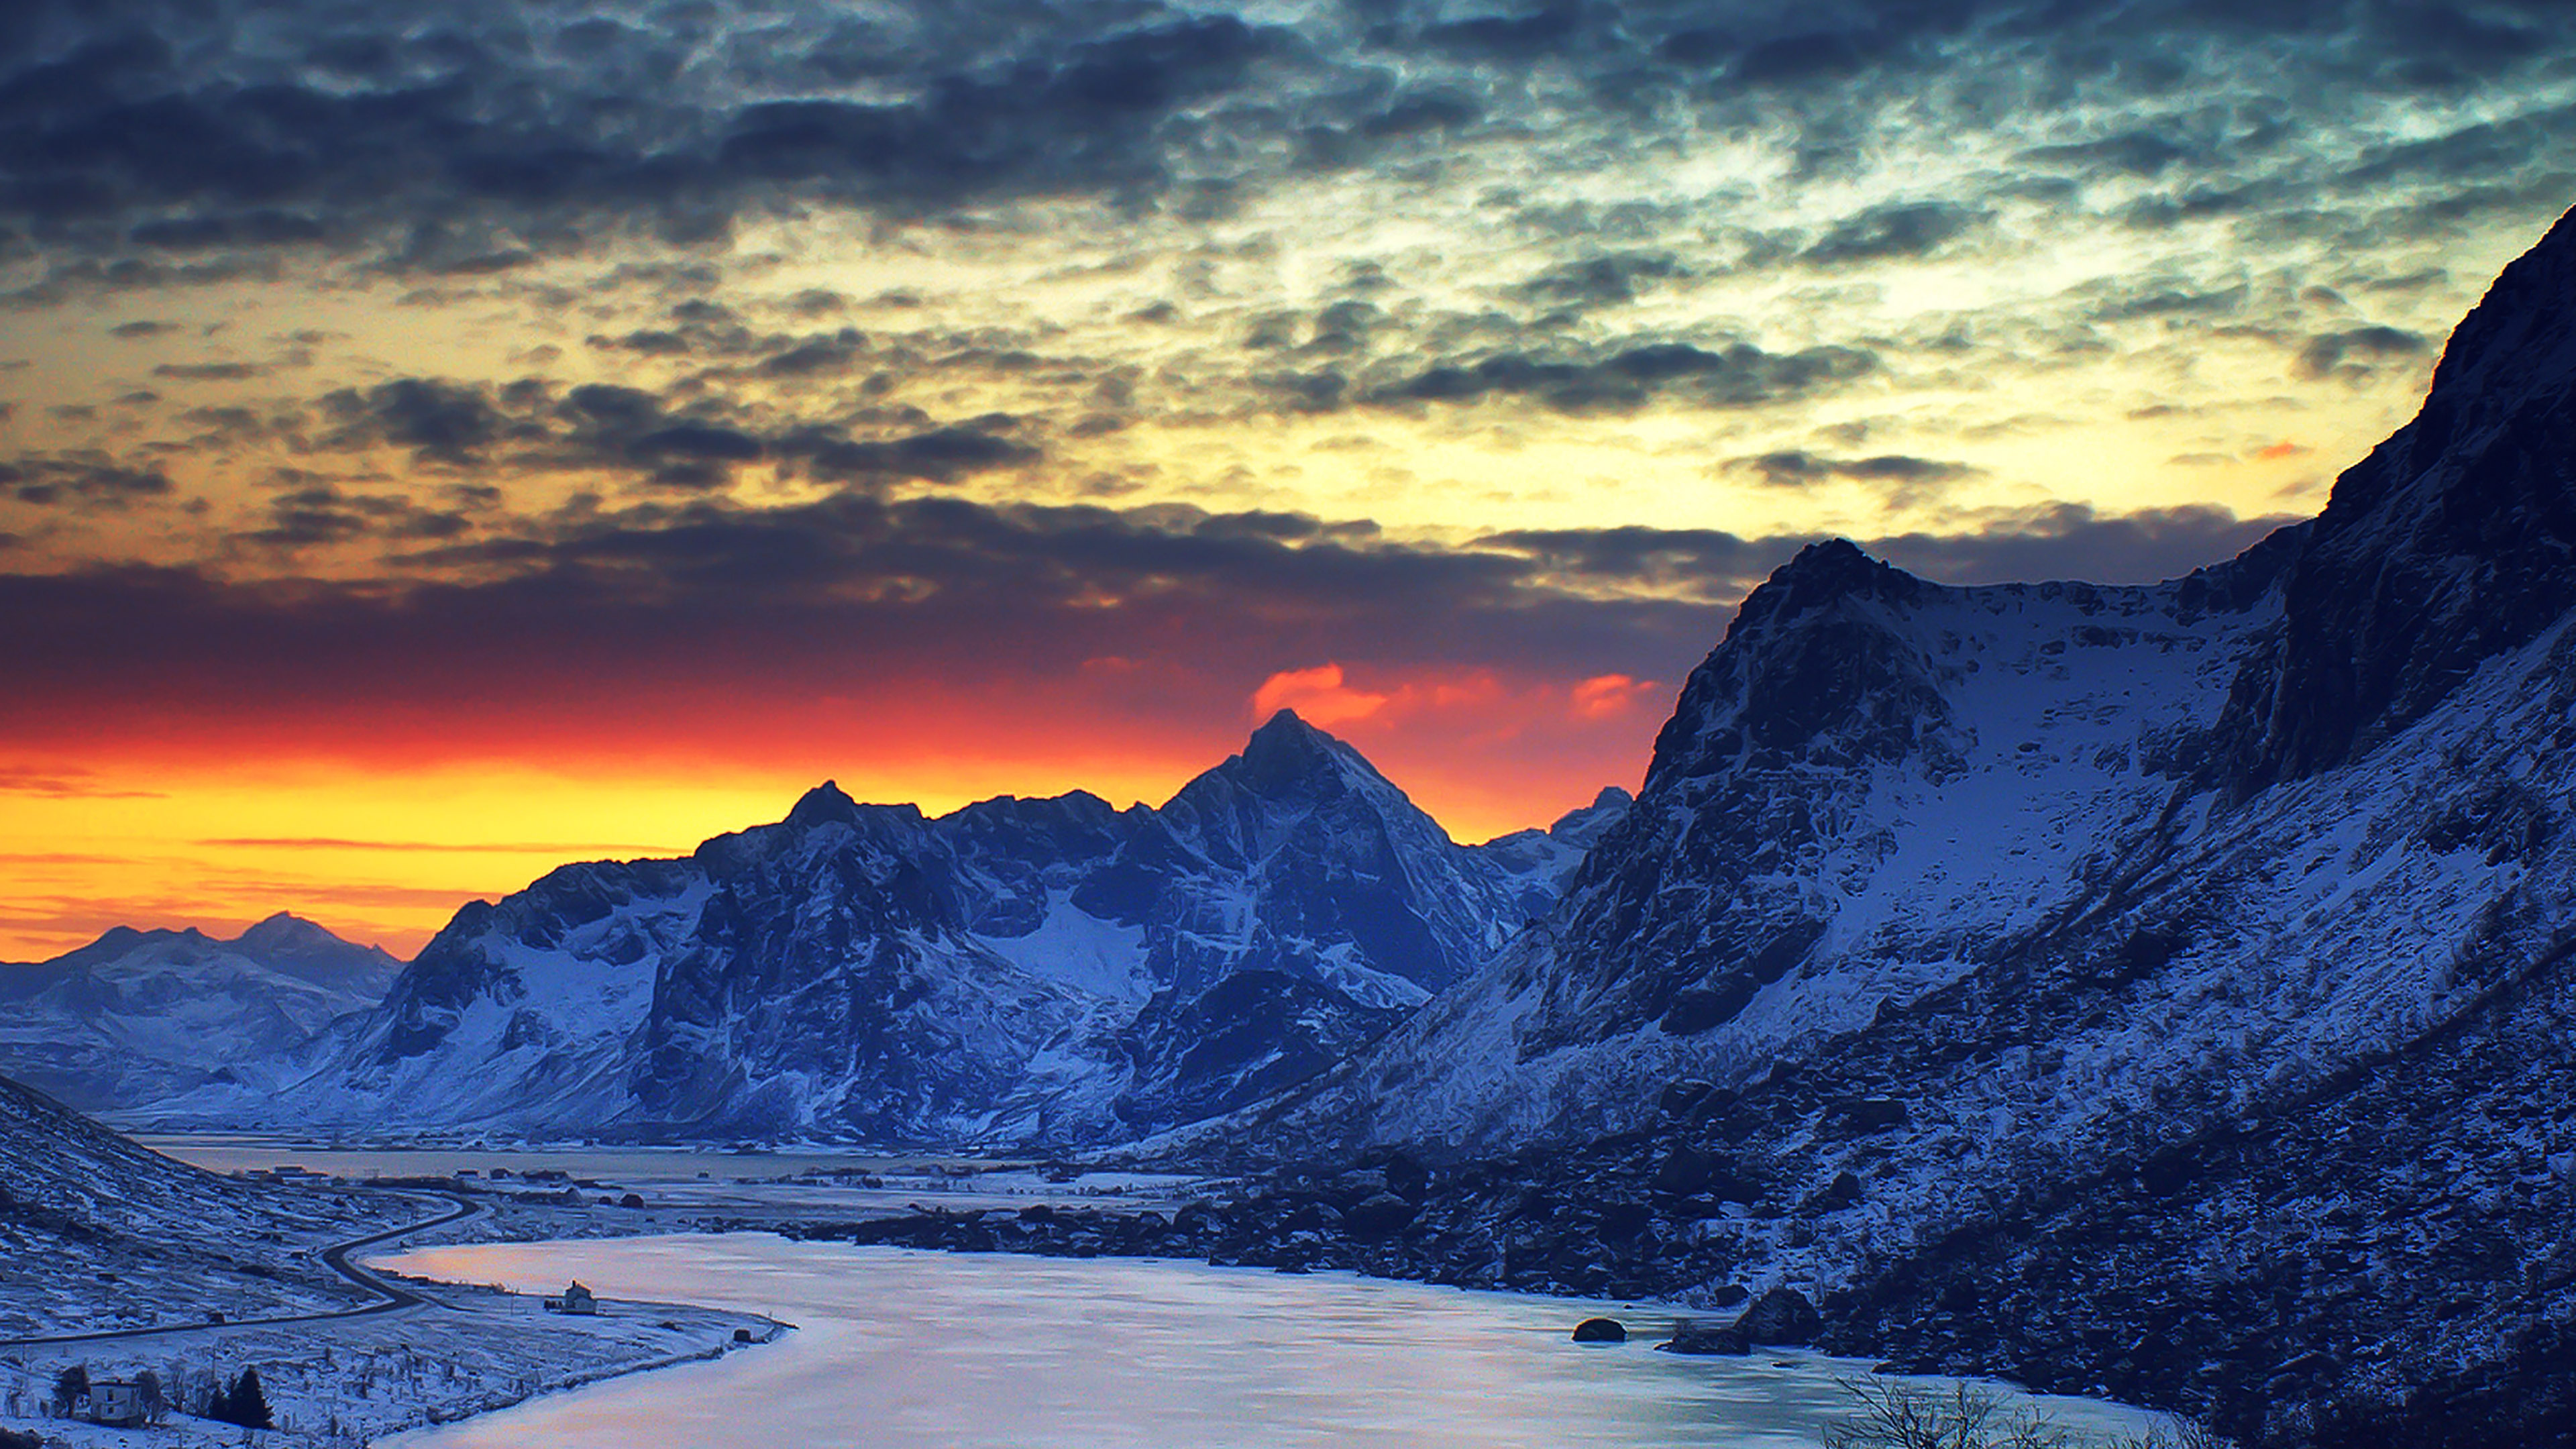 ml18-snow-lake-blue-night-mountain-cold-wallpaper